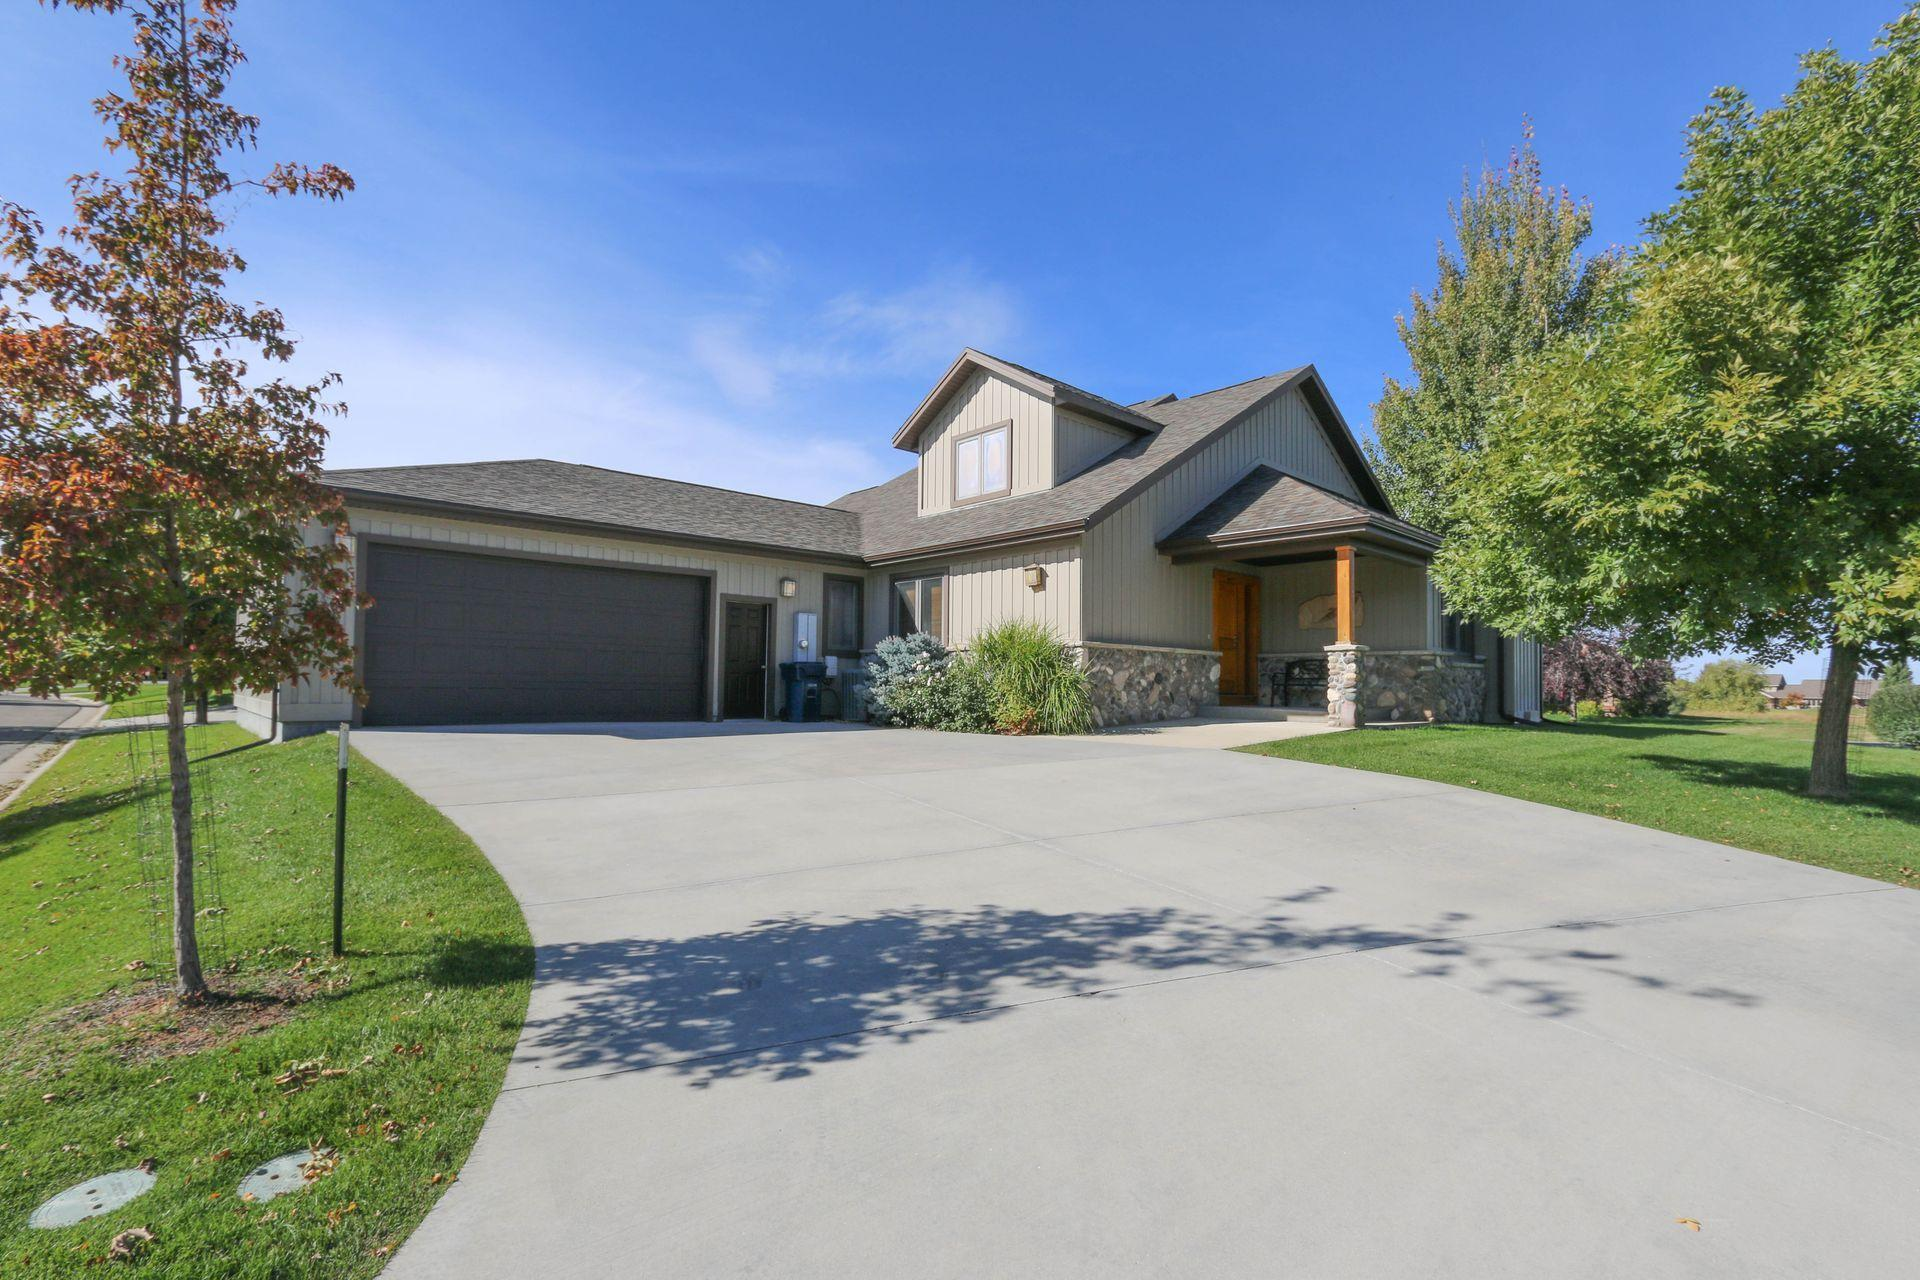 62 River Rock Road, Sheridan, Wyoming 82801, 3 Bedrooms Bedrooms, ,3 BathroomsBathrooms,Residential,For Sale,River Rock,18-1011